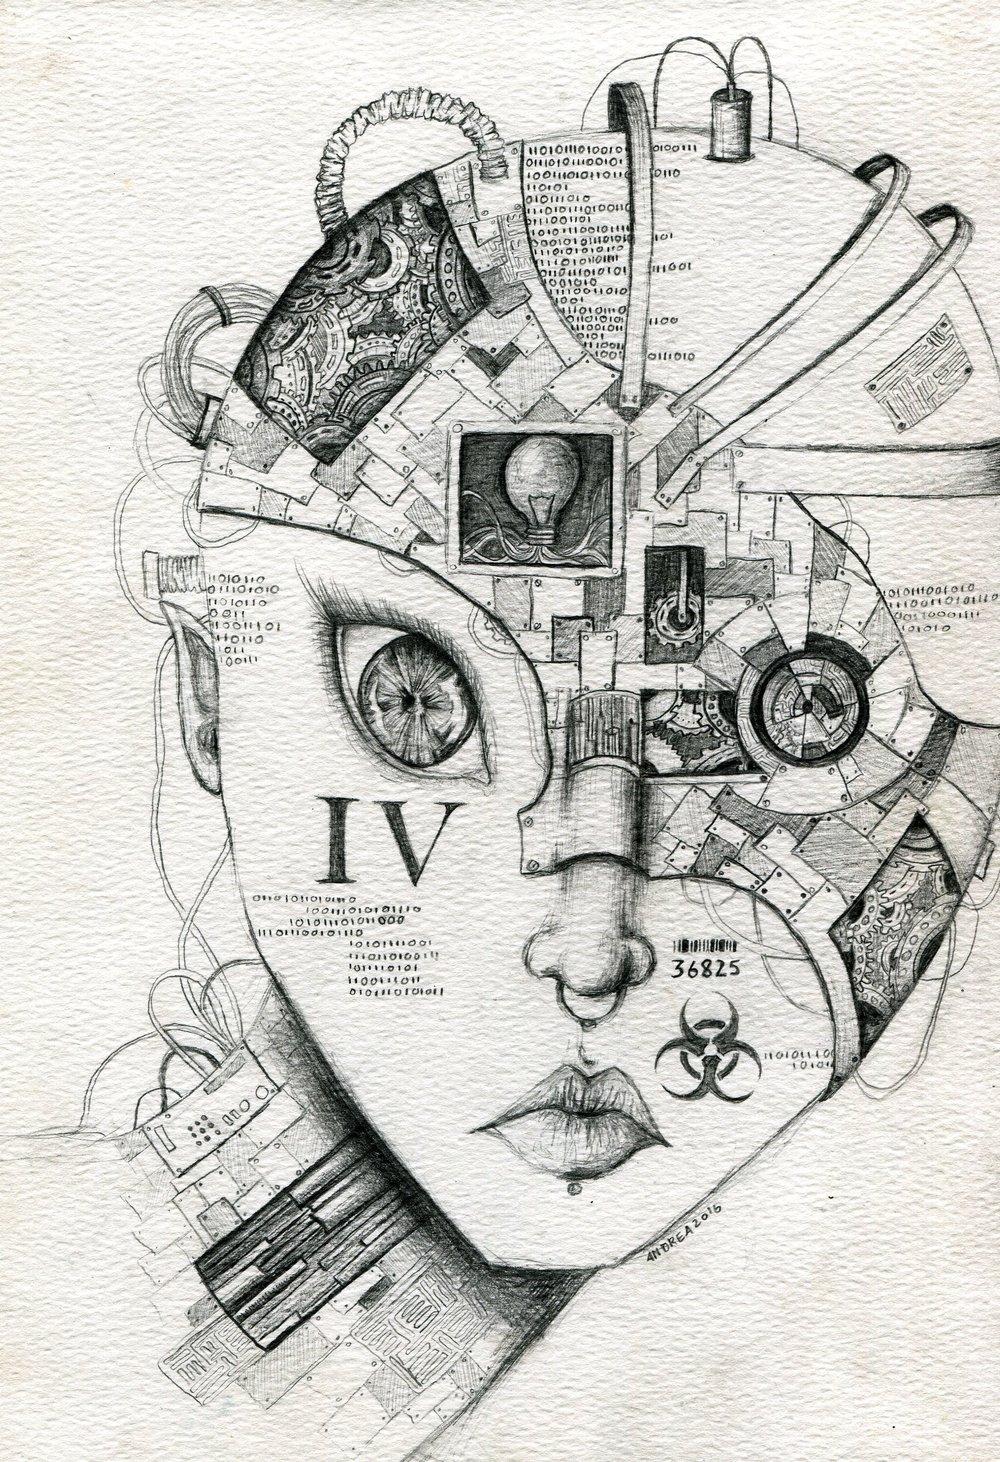 65c Andrea Rouillard, Steampunk Mask, Pencil on paper